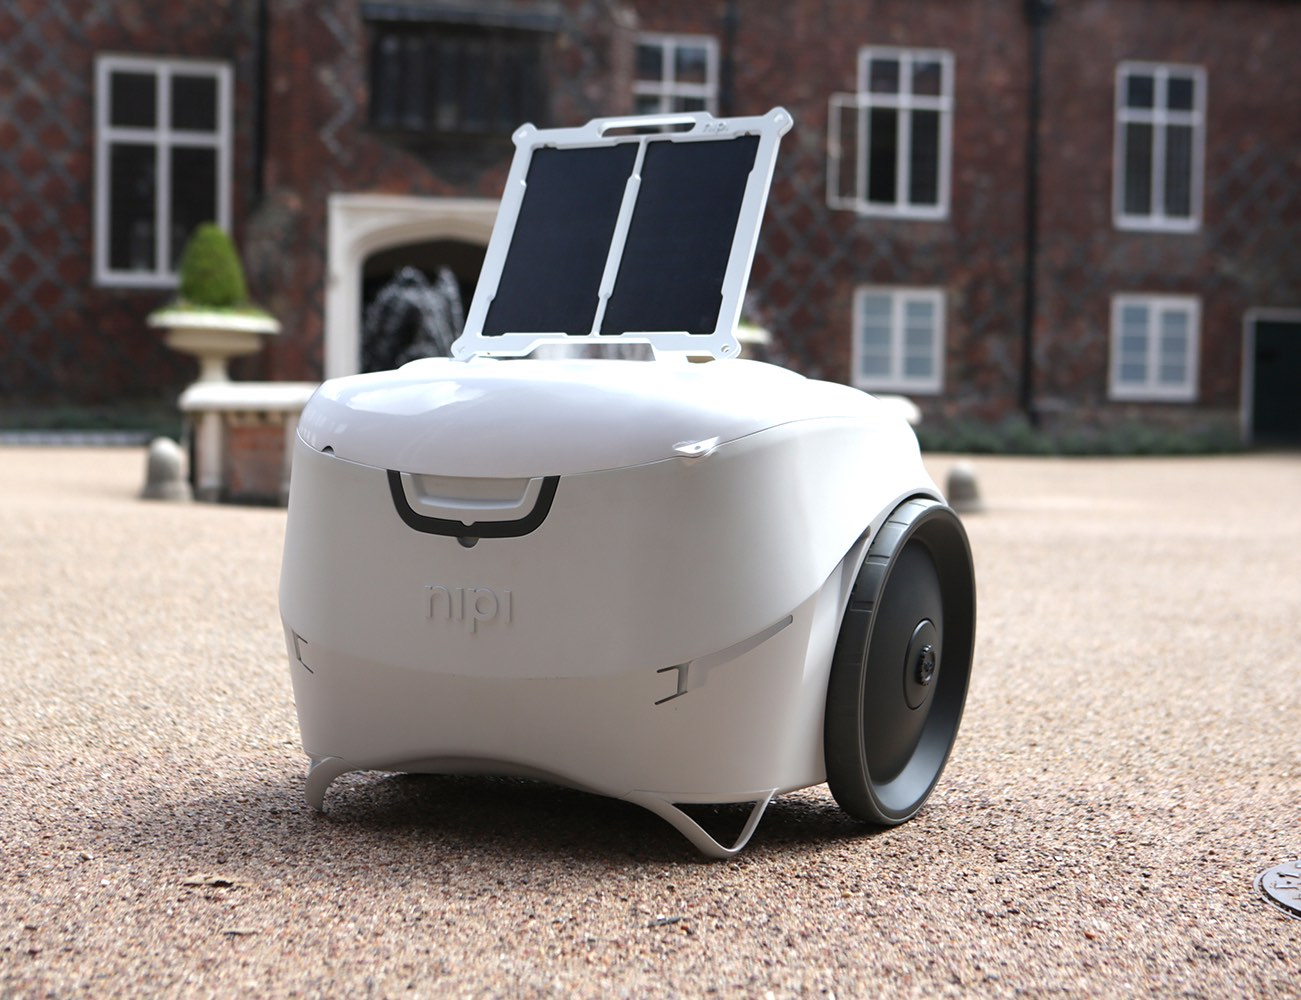 Nipi Smart Cooler 187 Gadget Flow